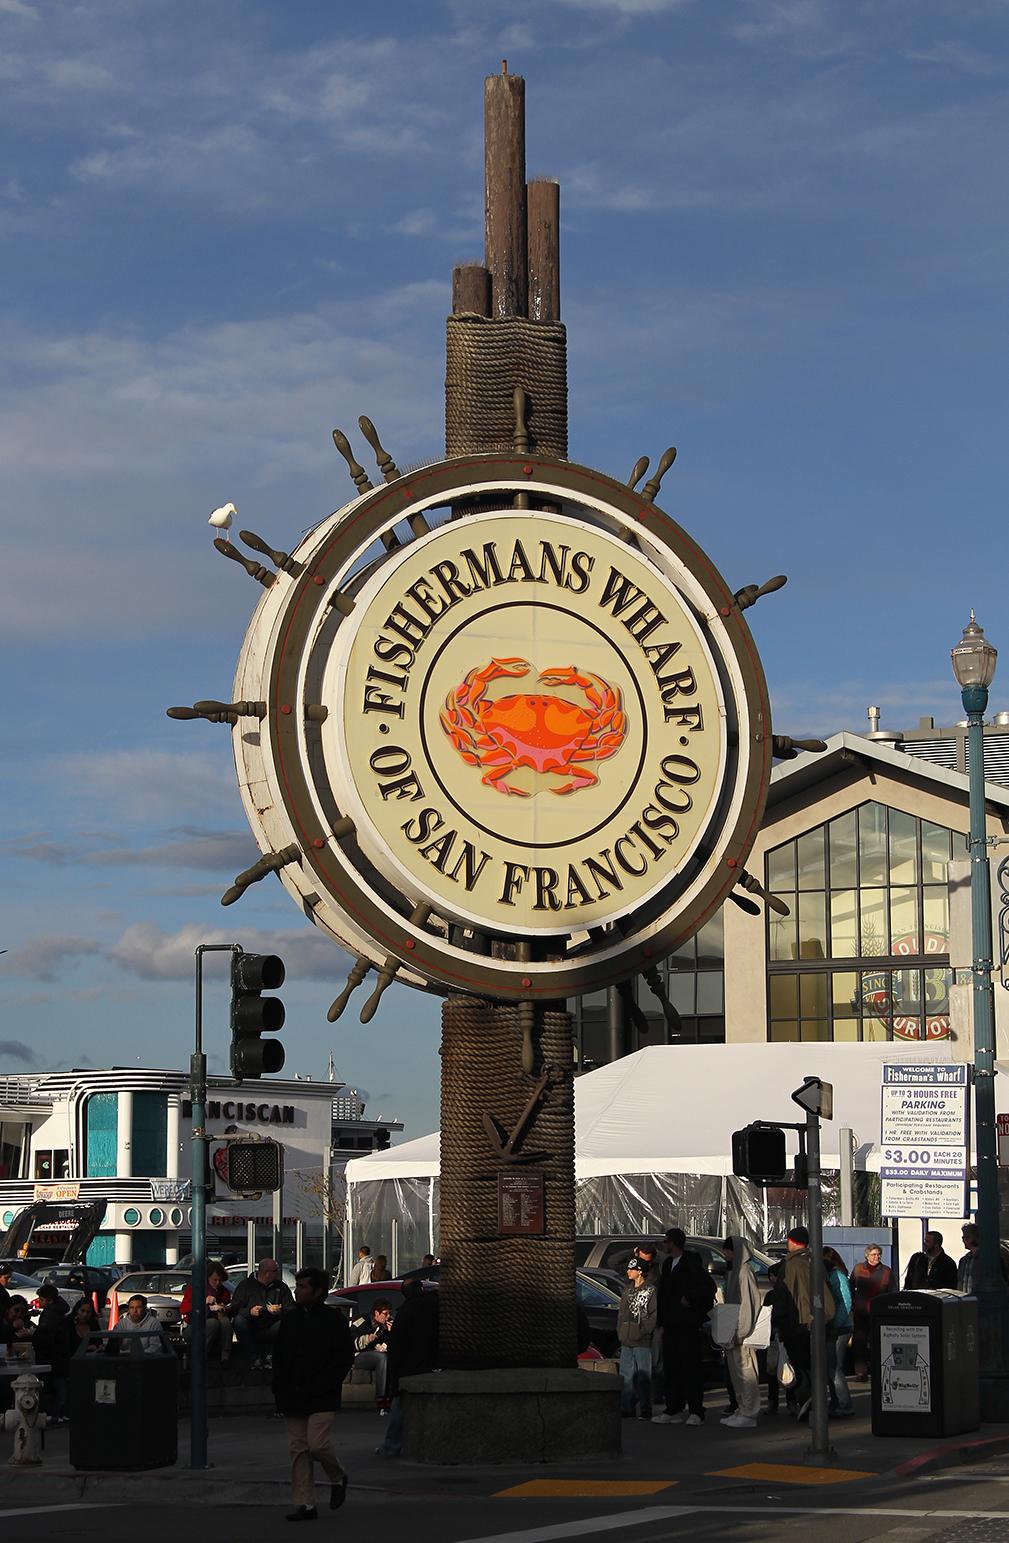 Breaking News On Fisherman's Wharf, San Francisco, Ca, Us